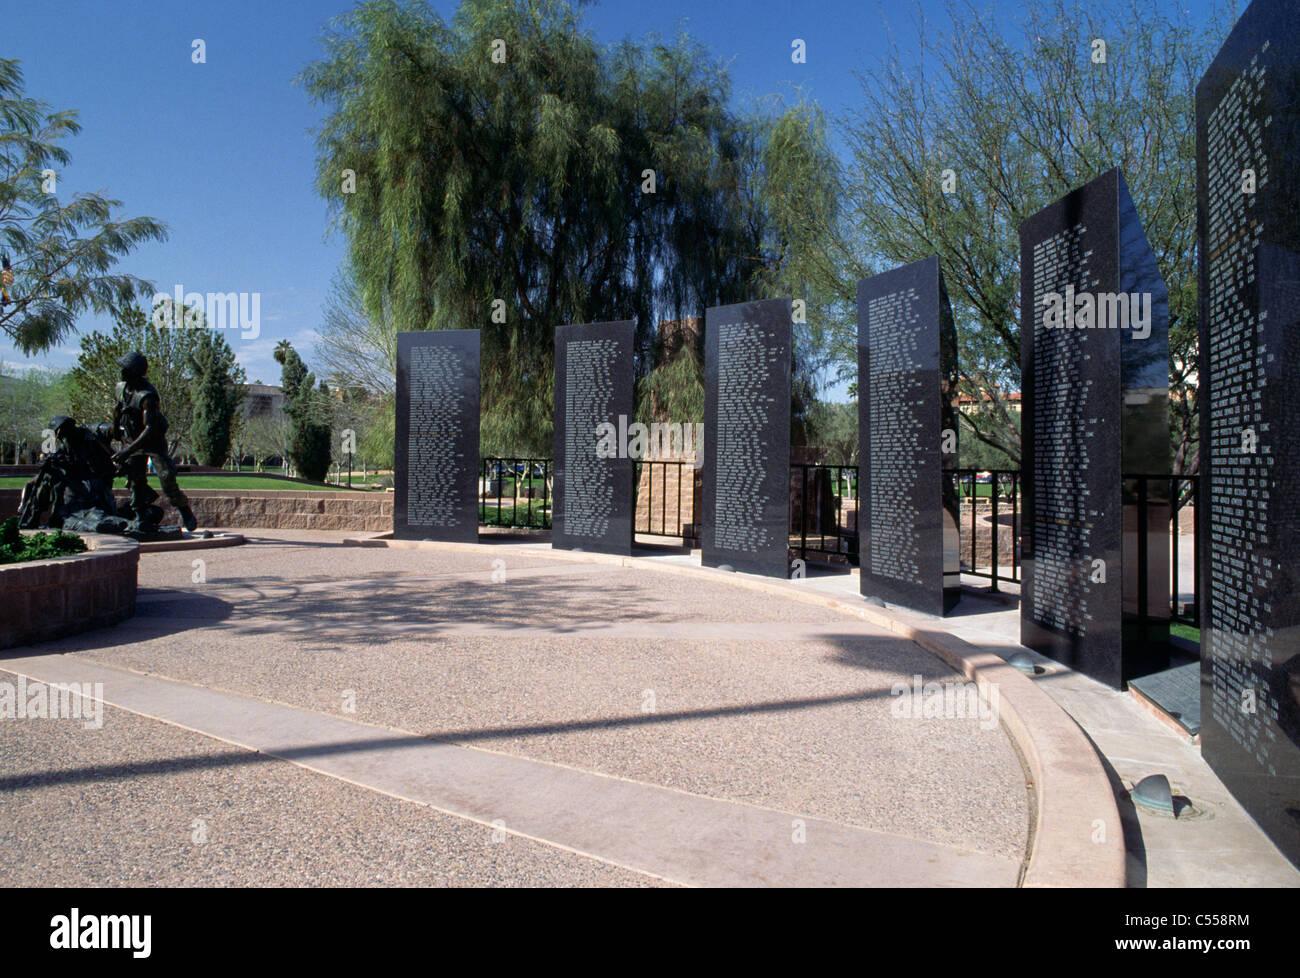 Lápidas en un memorial, Vietnam Veterans Memorial, Phoenix, Arizona, EE.UU. Foto de stock